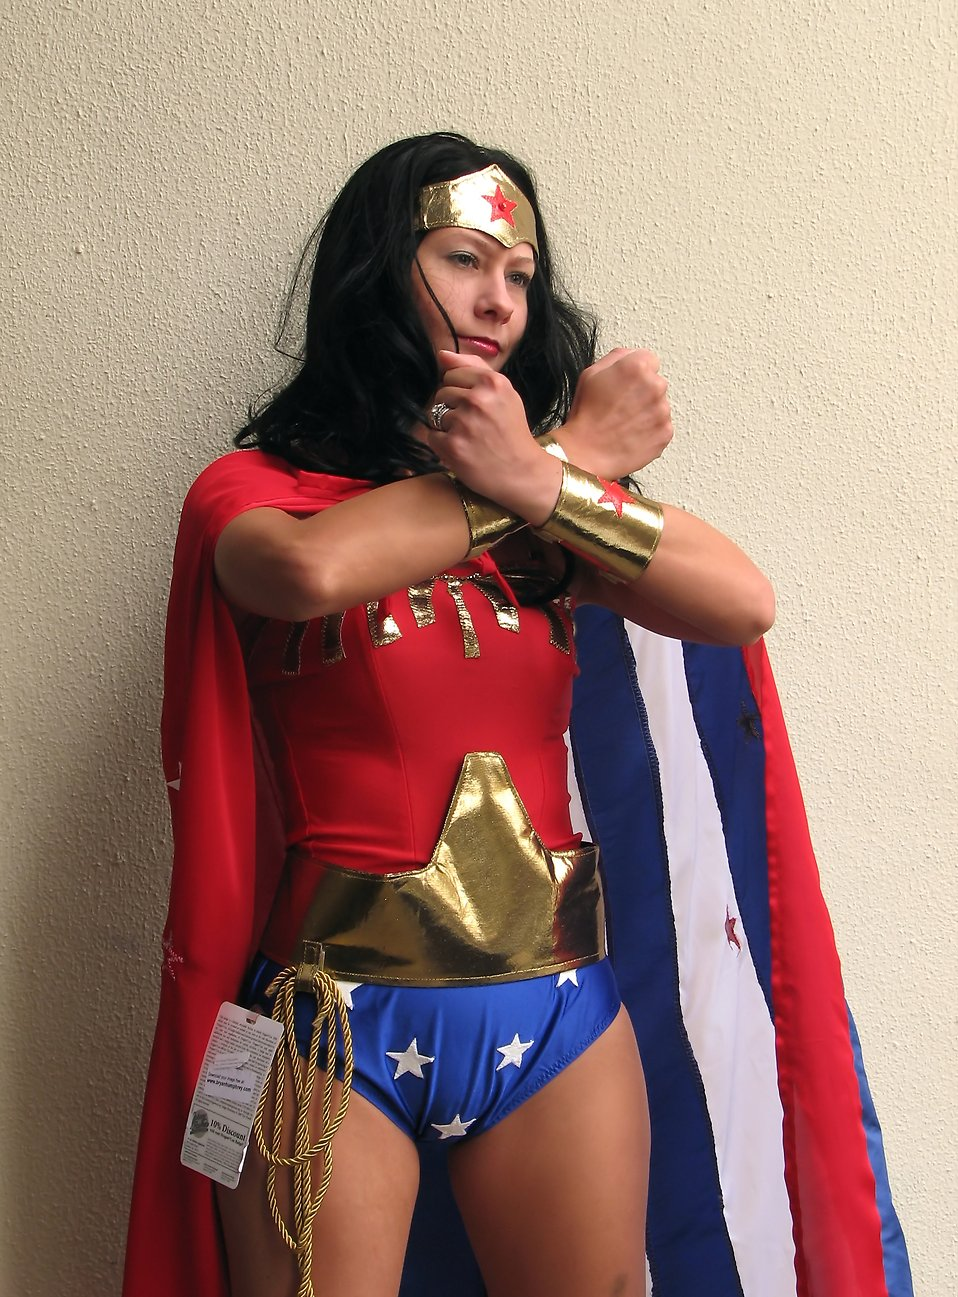 A beautiful girl in a Wonder Woman costume at Dragoncon 2009 in Atlanta, Georgia : Free Stock Photo